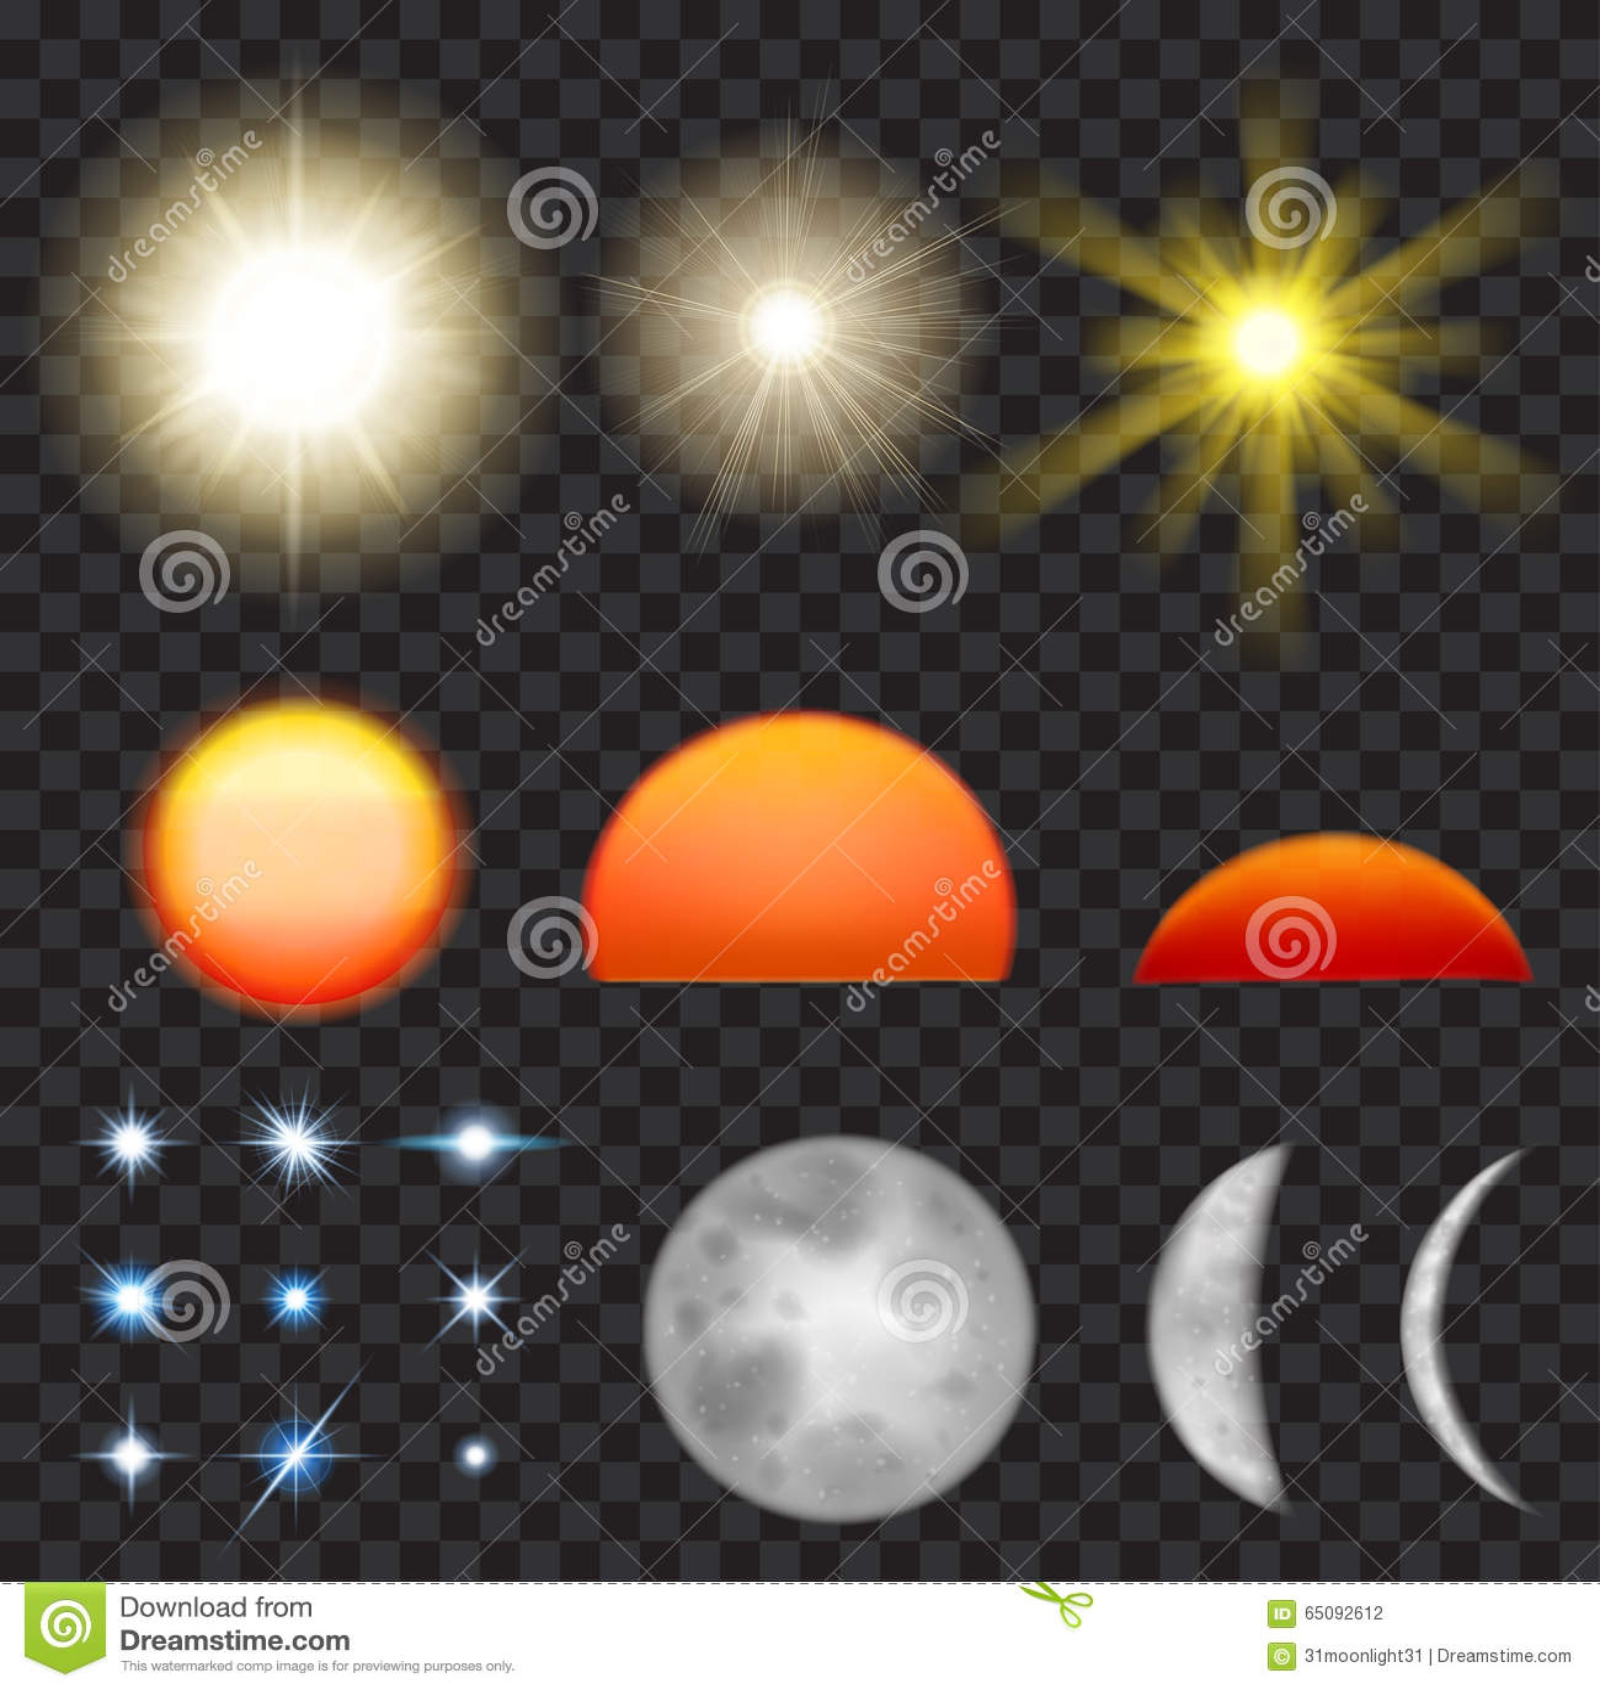 star background sun moon - photo #27